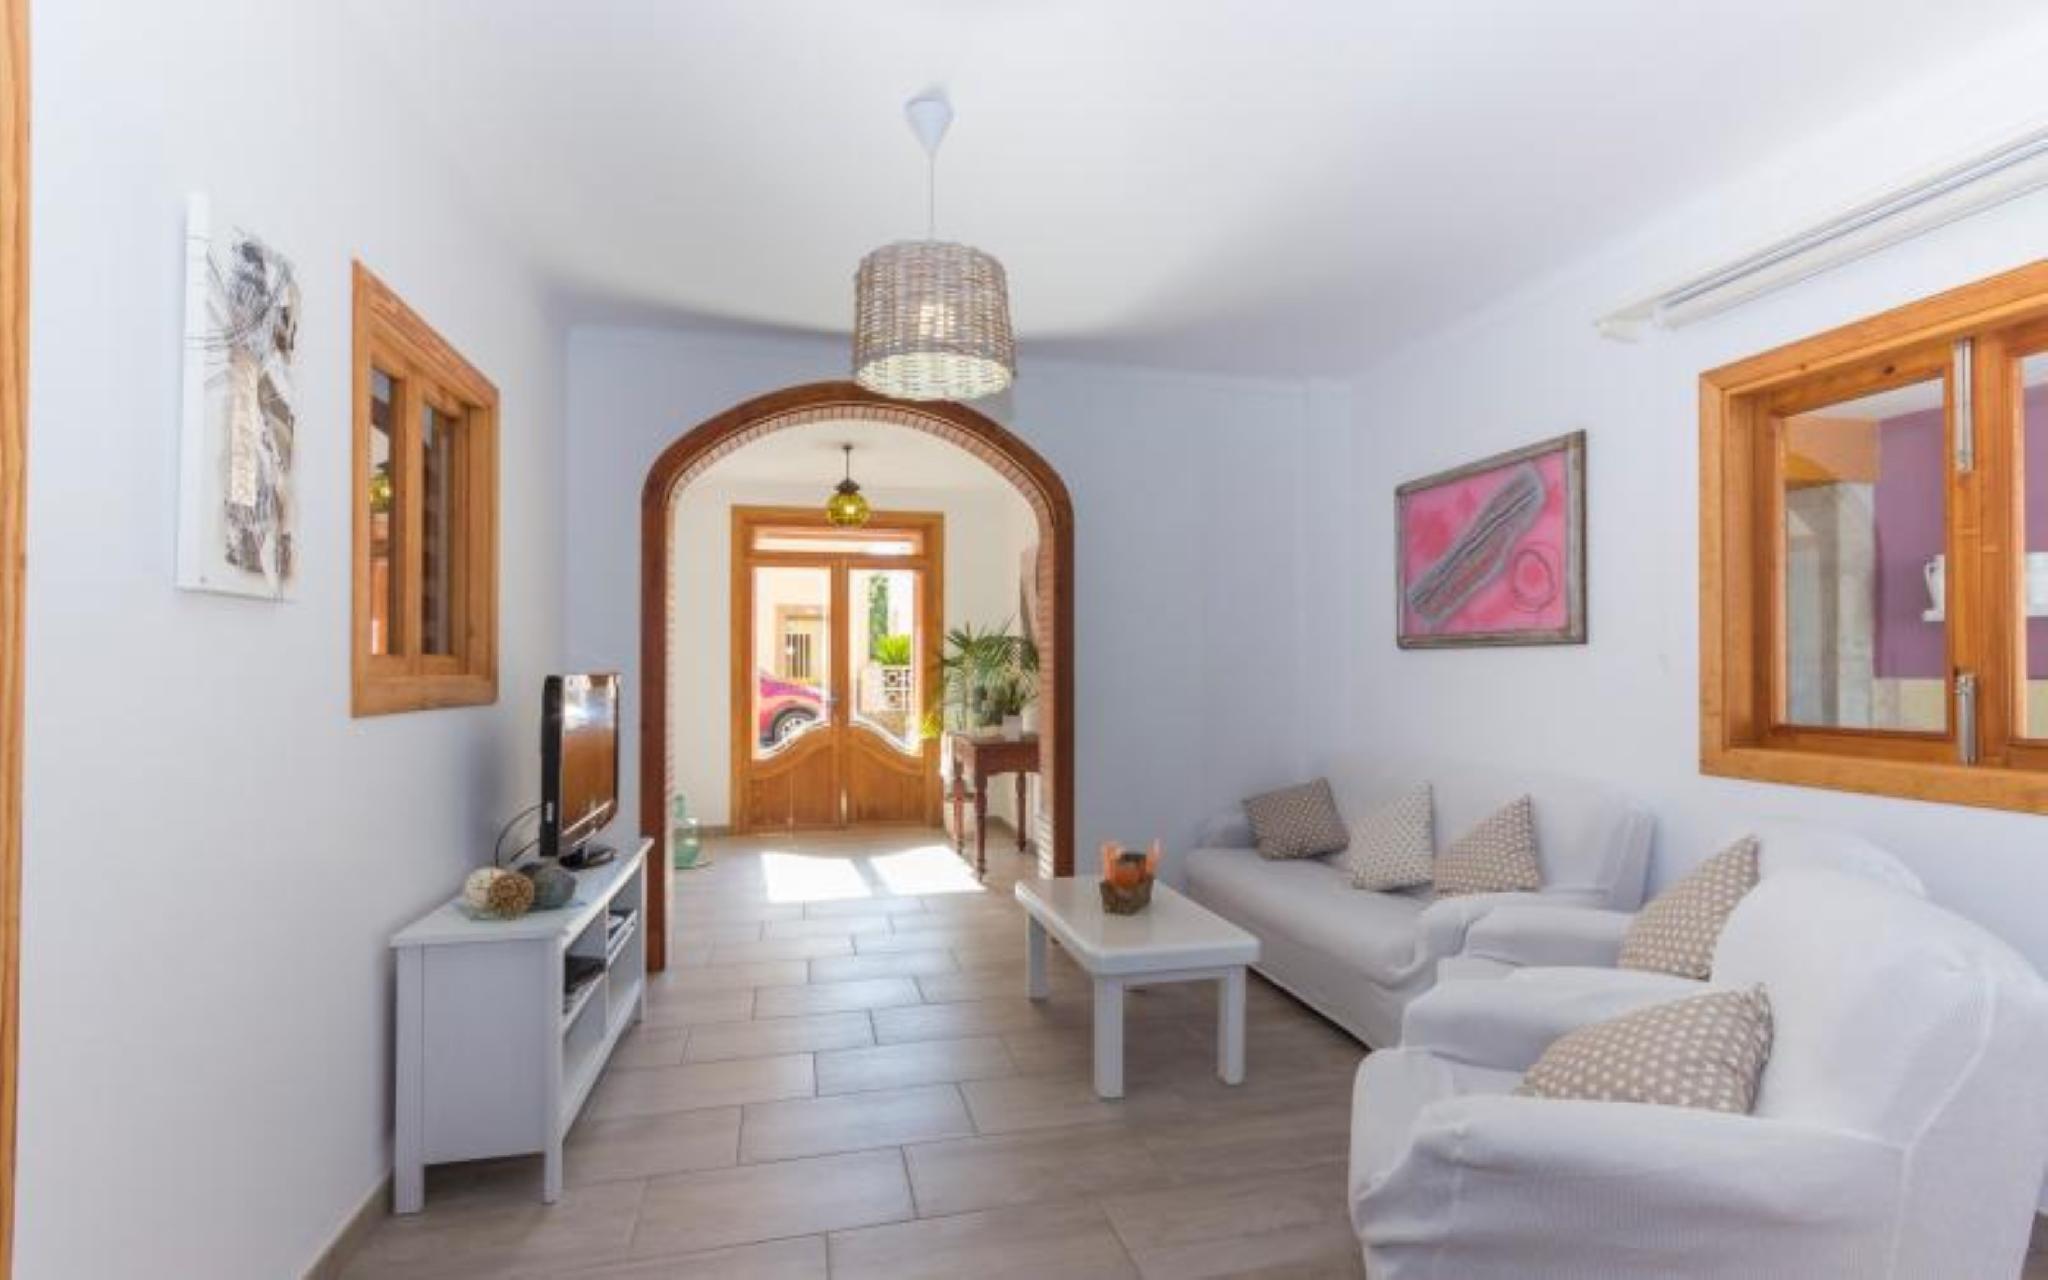 106227 - House in Santa Margalida